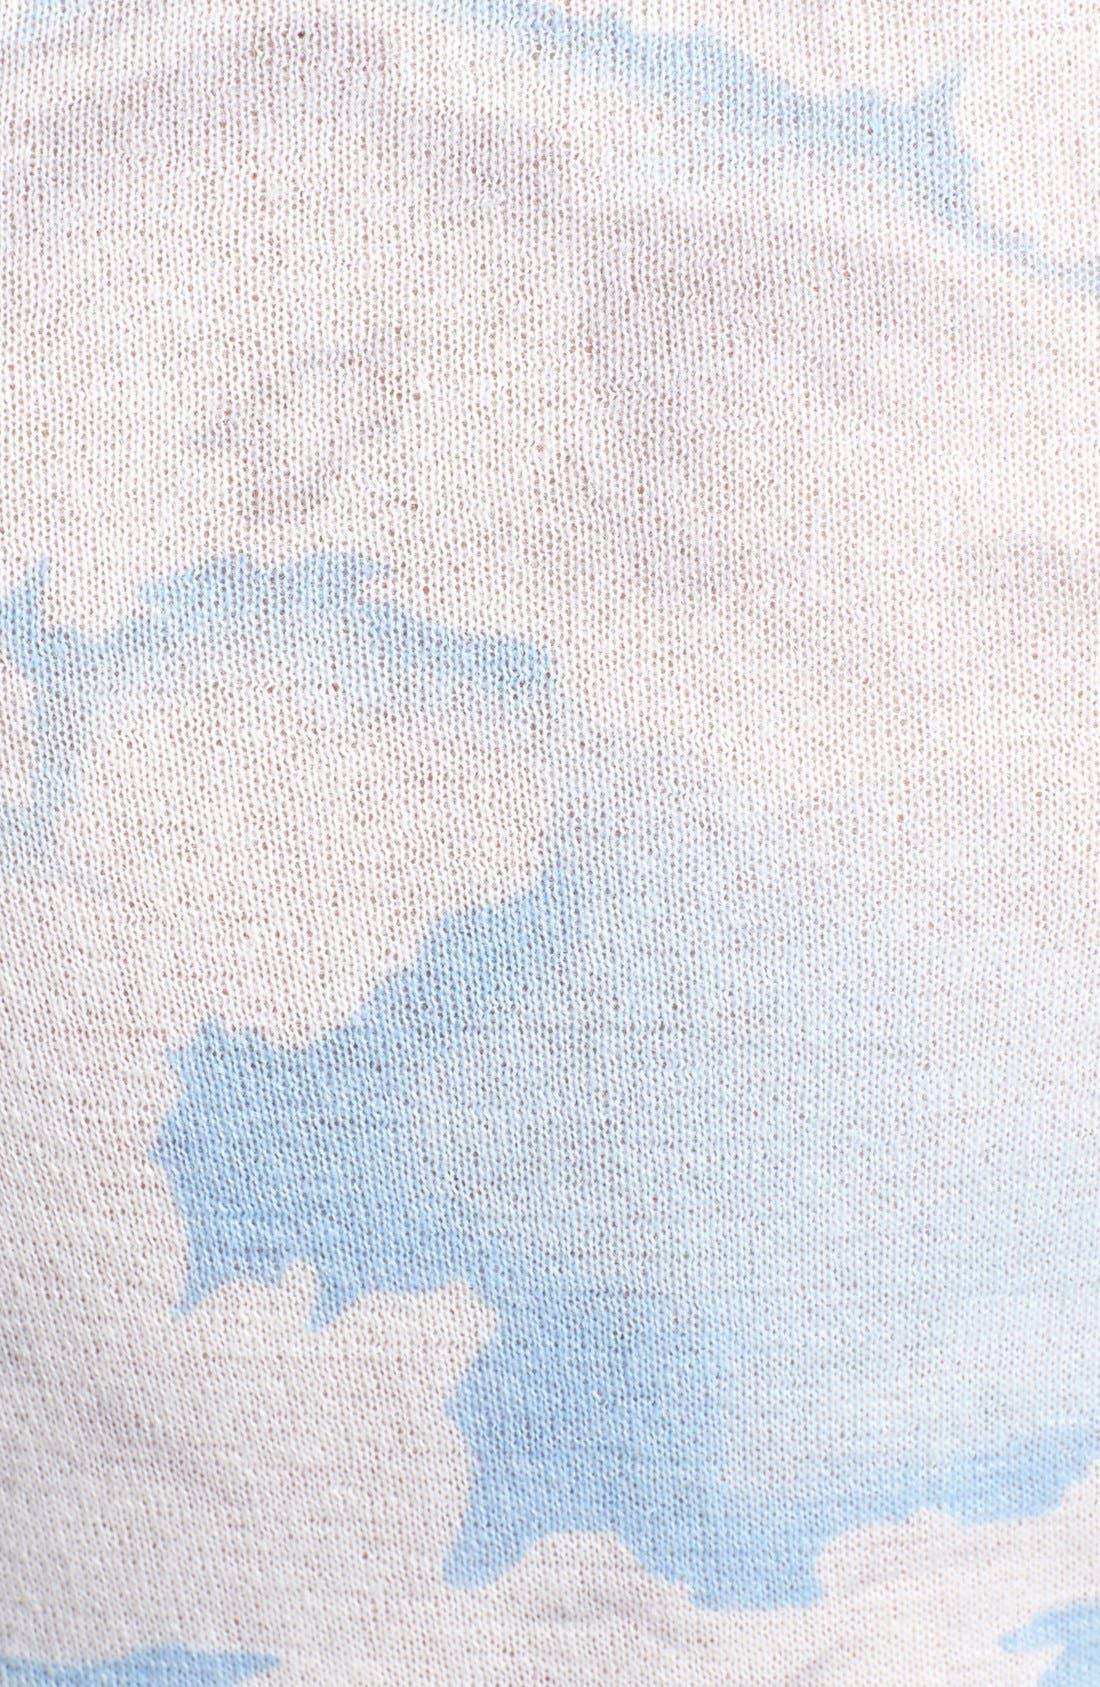 Cloud Print Sweater,                             Alternate thumbnail 2, color,                             450